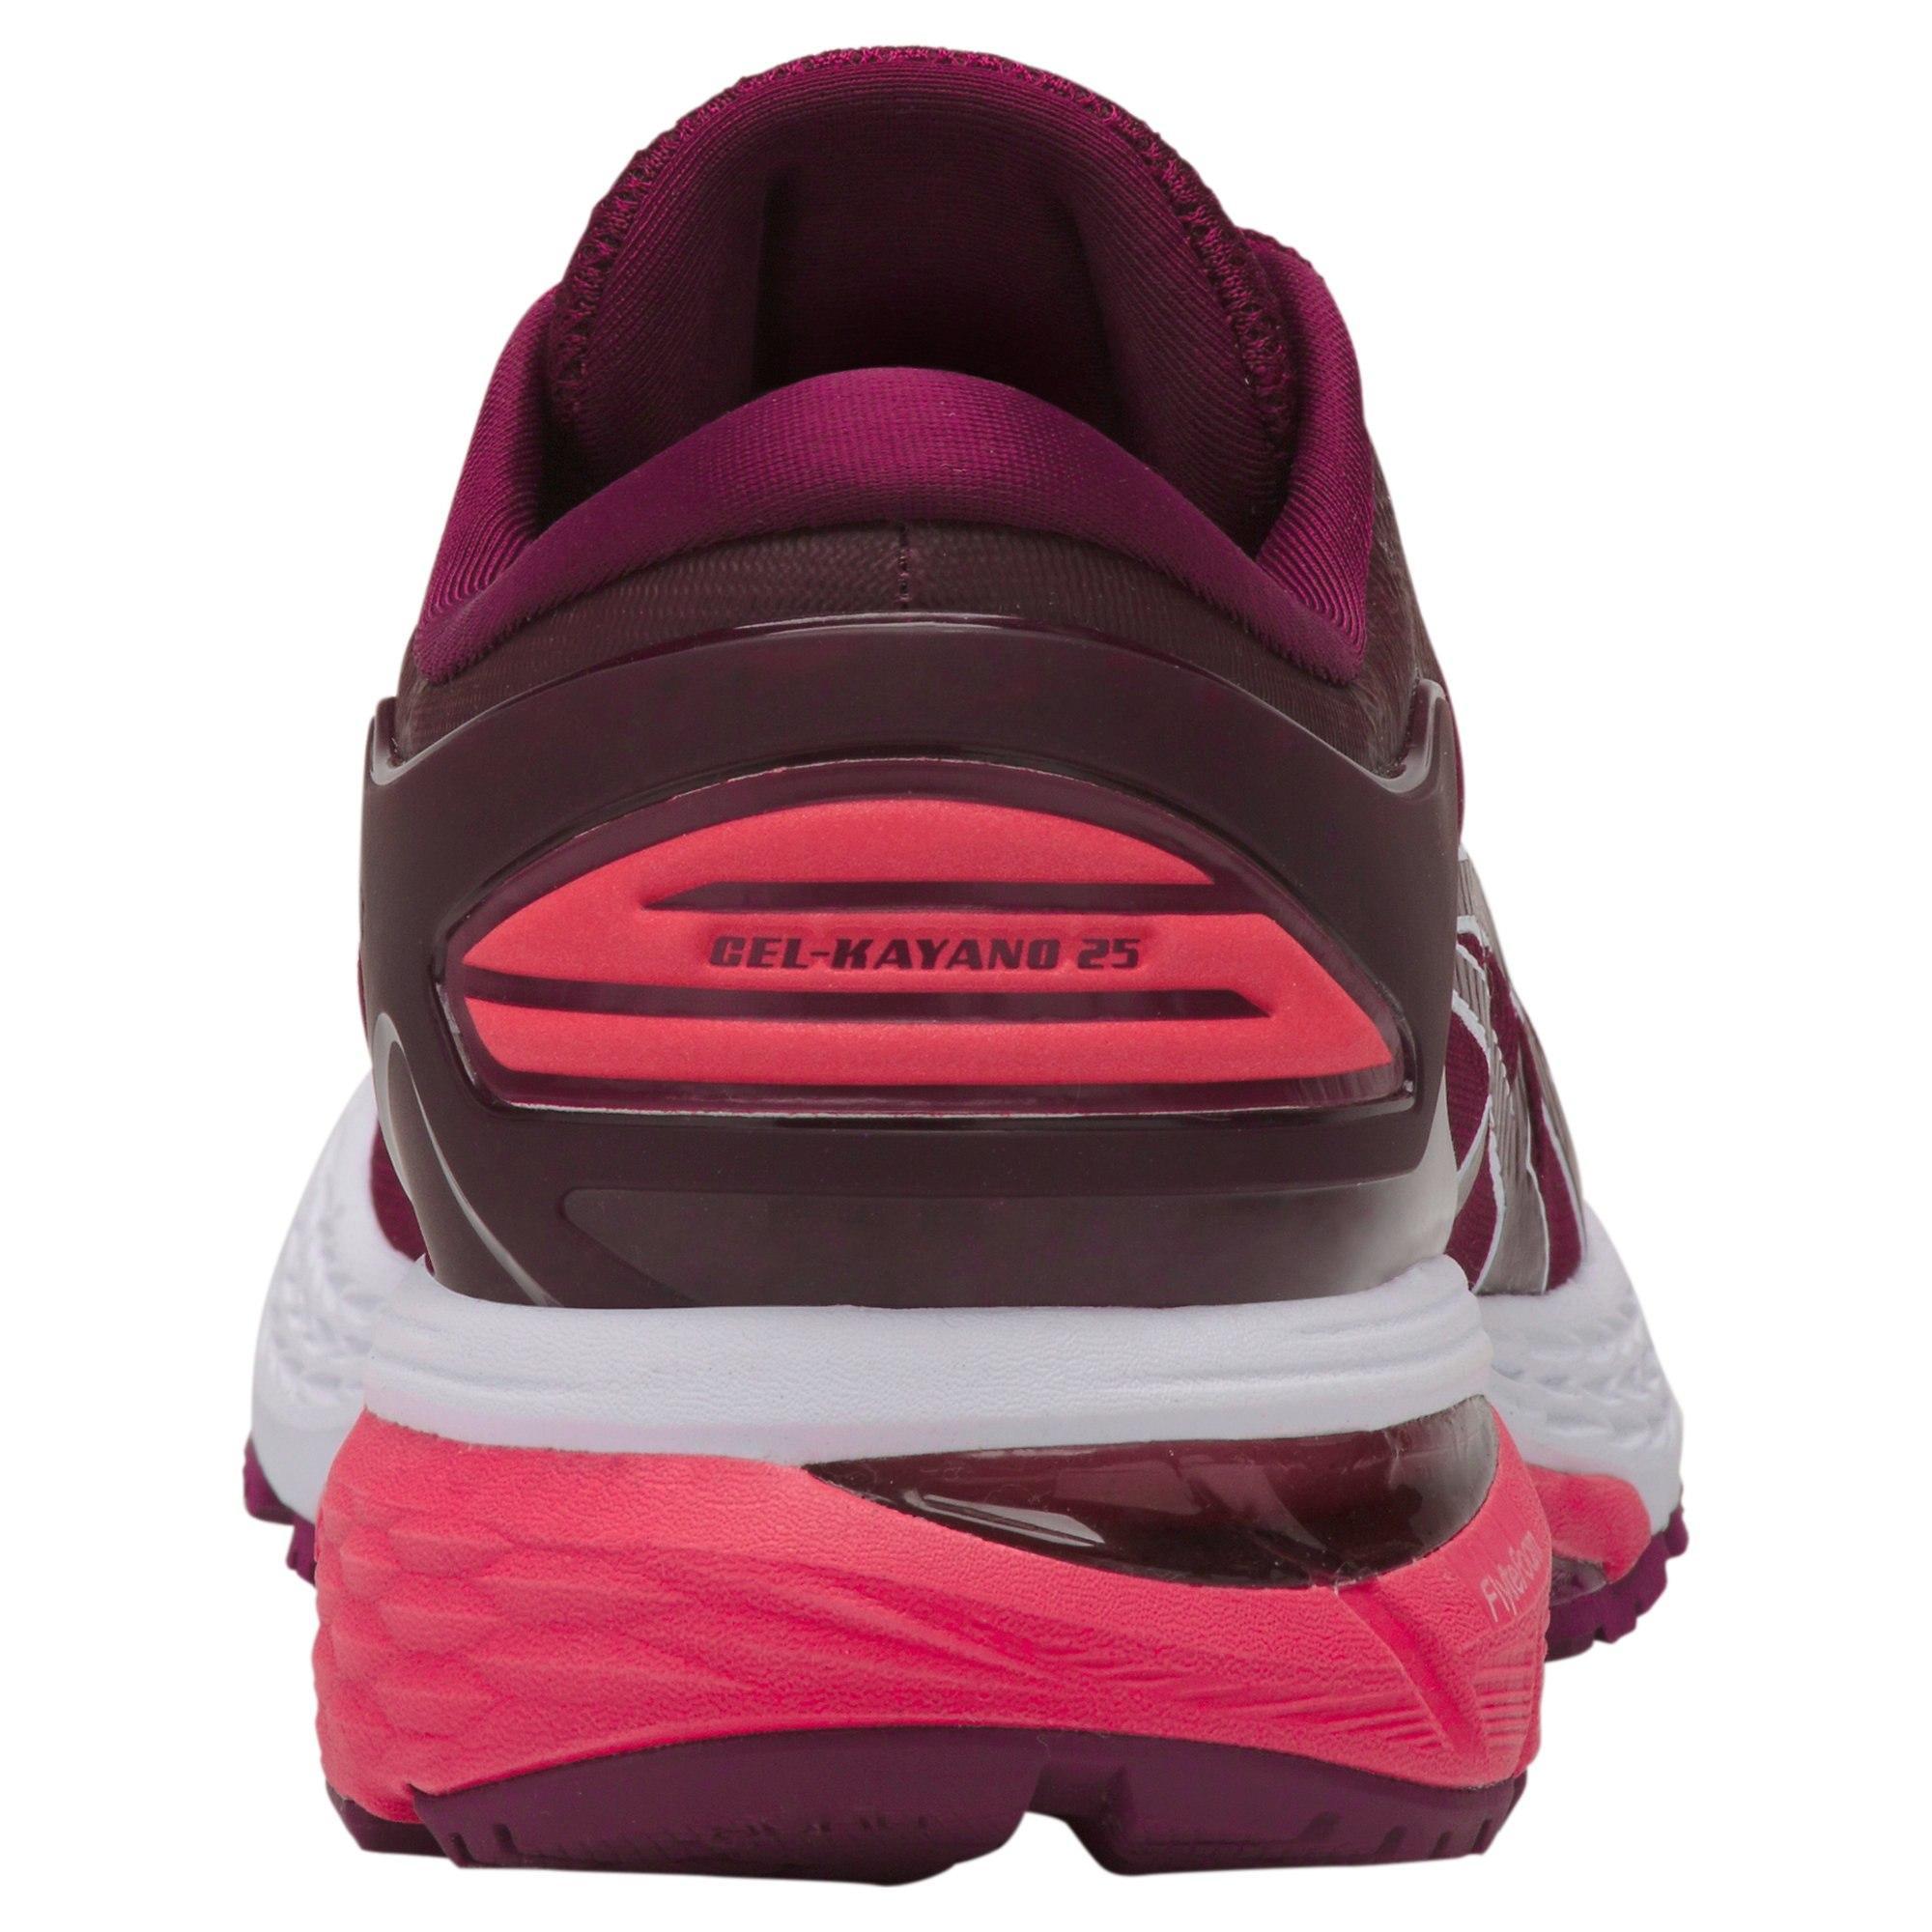 aacd754cea12c Asics Womens GEL-Kayano 25 Running Shoes - Roselle/Pink - Tennisnuts.com